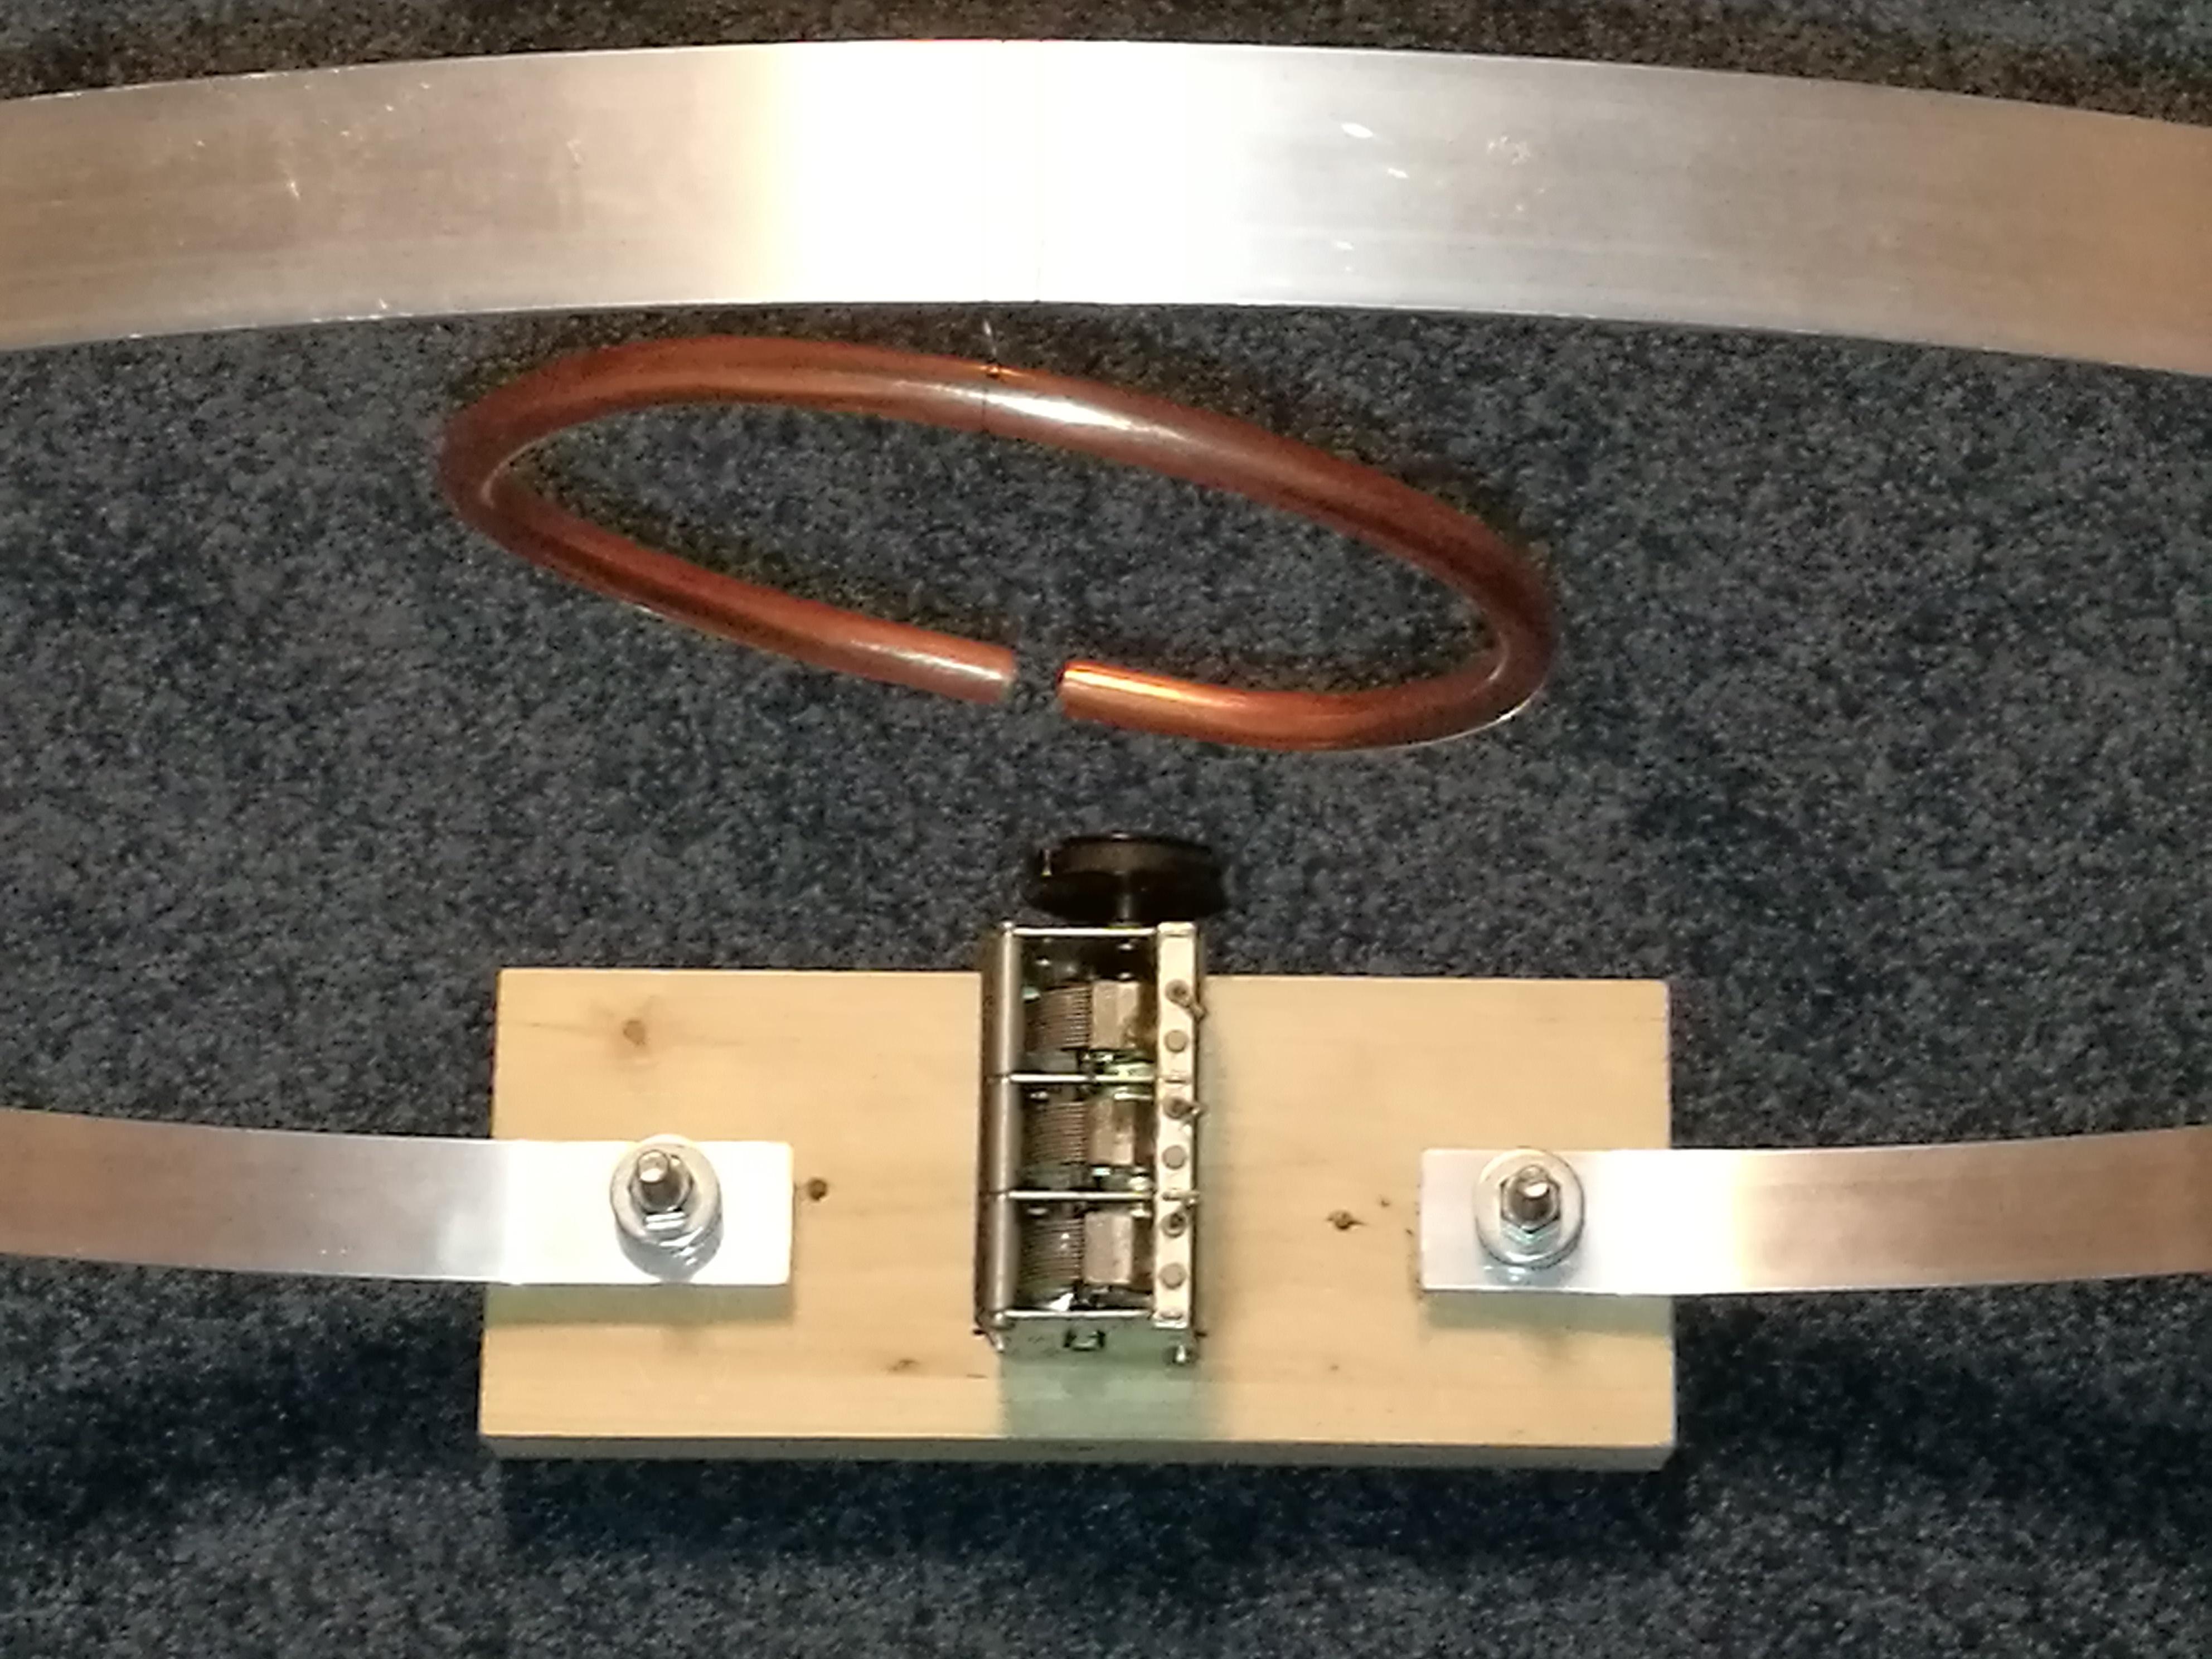 eigenbau magnetic loop antenne f r sdr radio auf kurzwelle. Black Bedroom Furniture Sets. Home Design Ideas